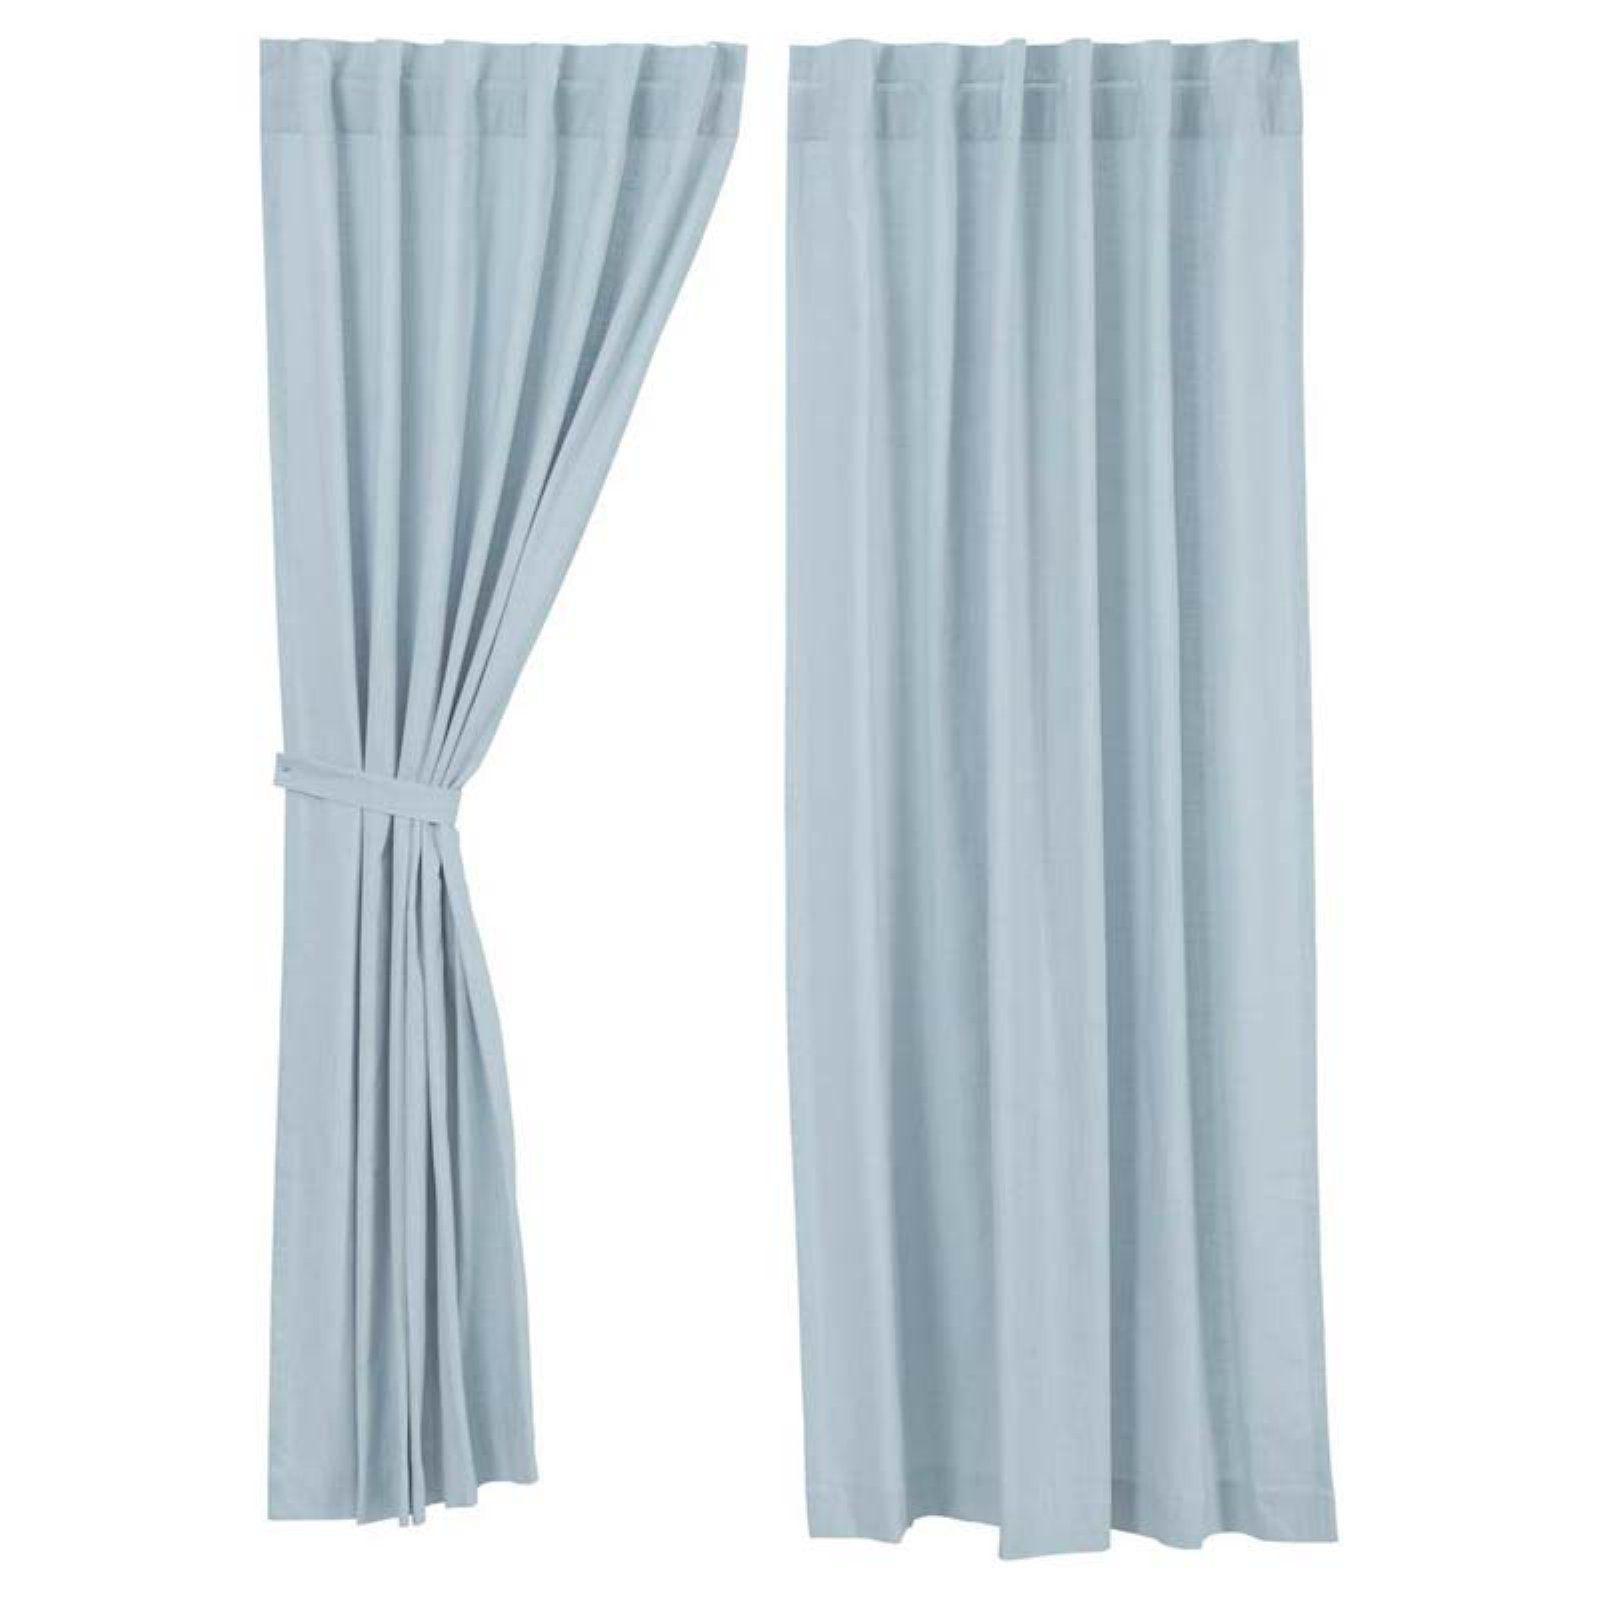 Vhc Brands Regina Curtain Panel Set Light Blue Blue Panels Panel Curtains Blue Curtains